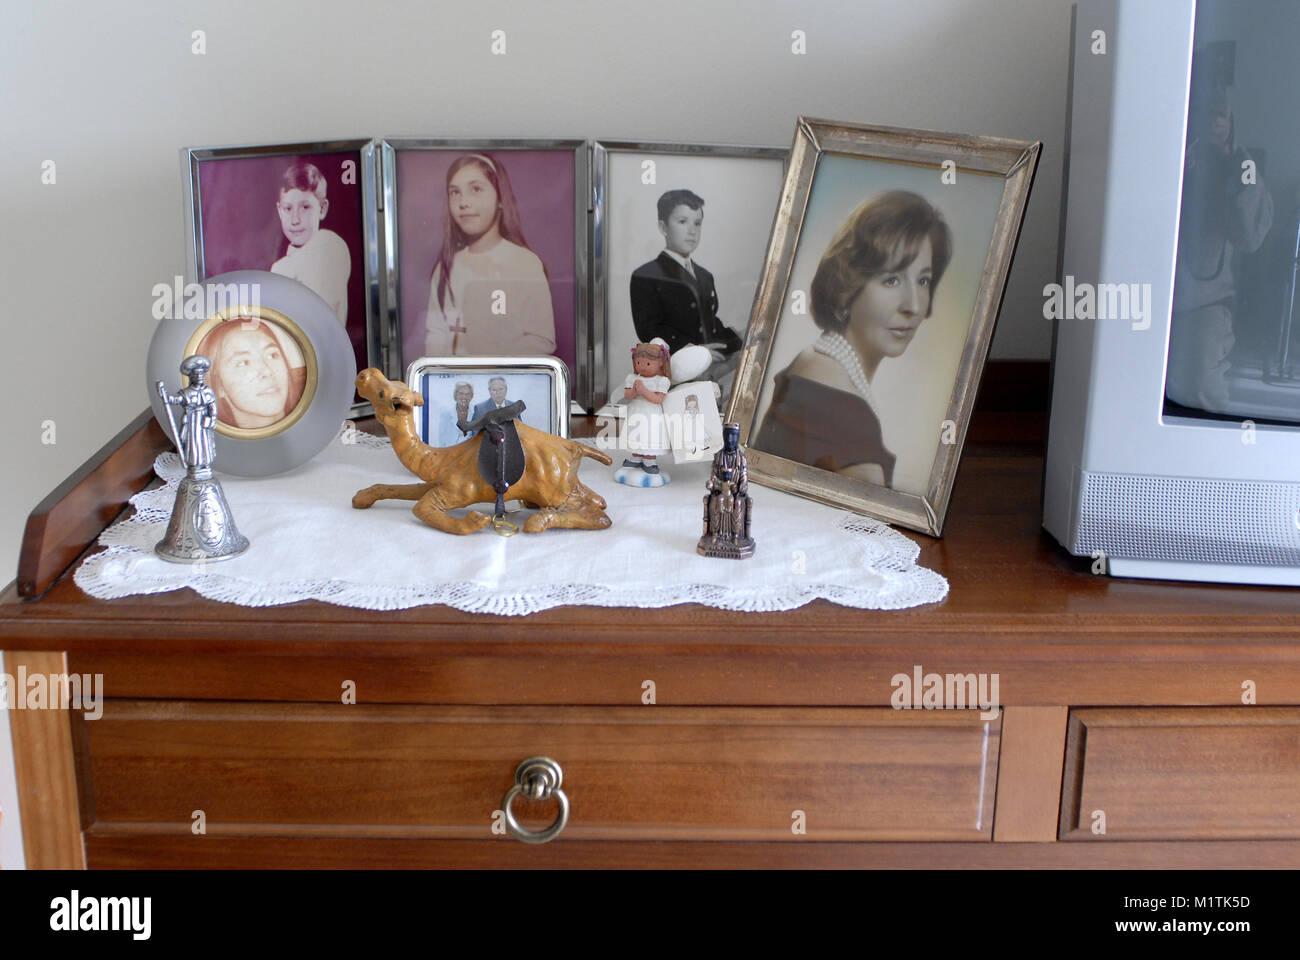 still life of family framed photos - Stock Image